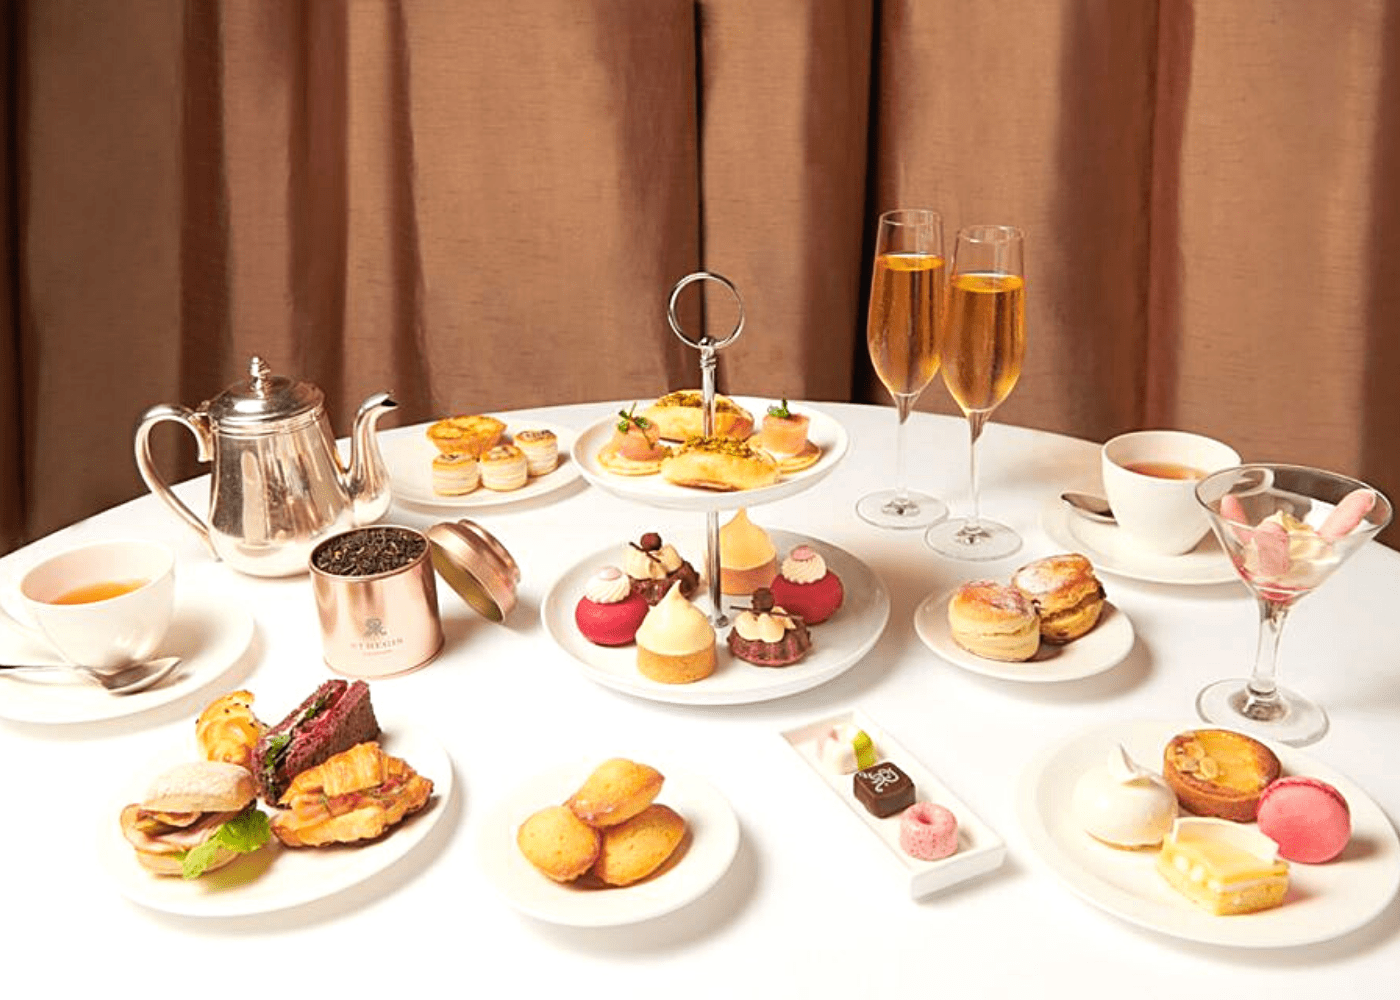 Afternoon tea set at Brasserie Les Saveurs